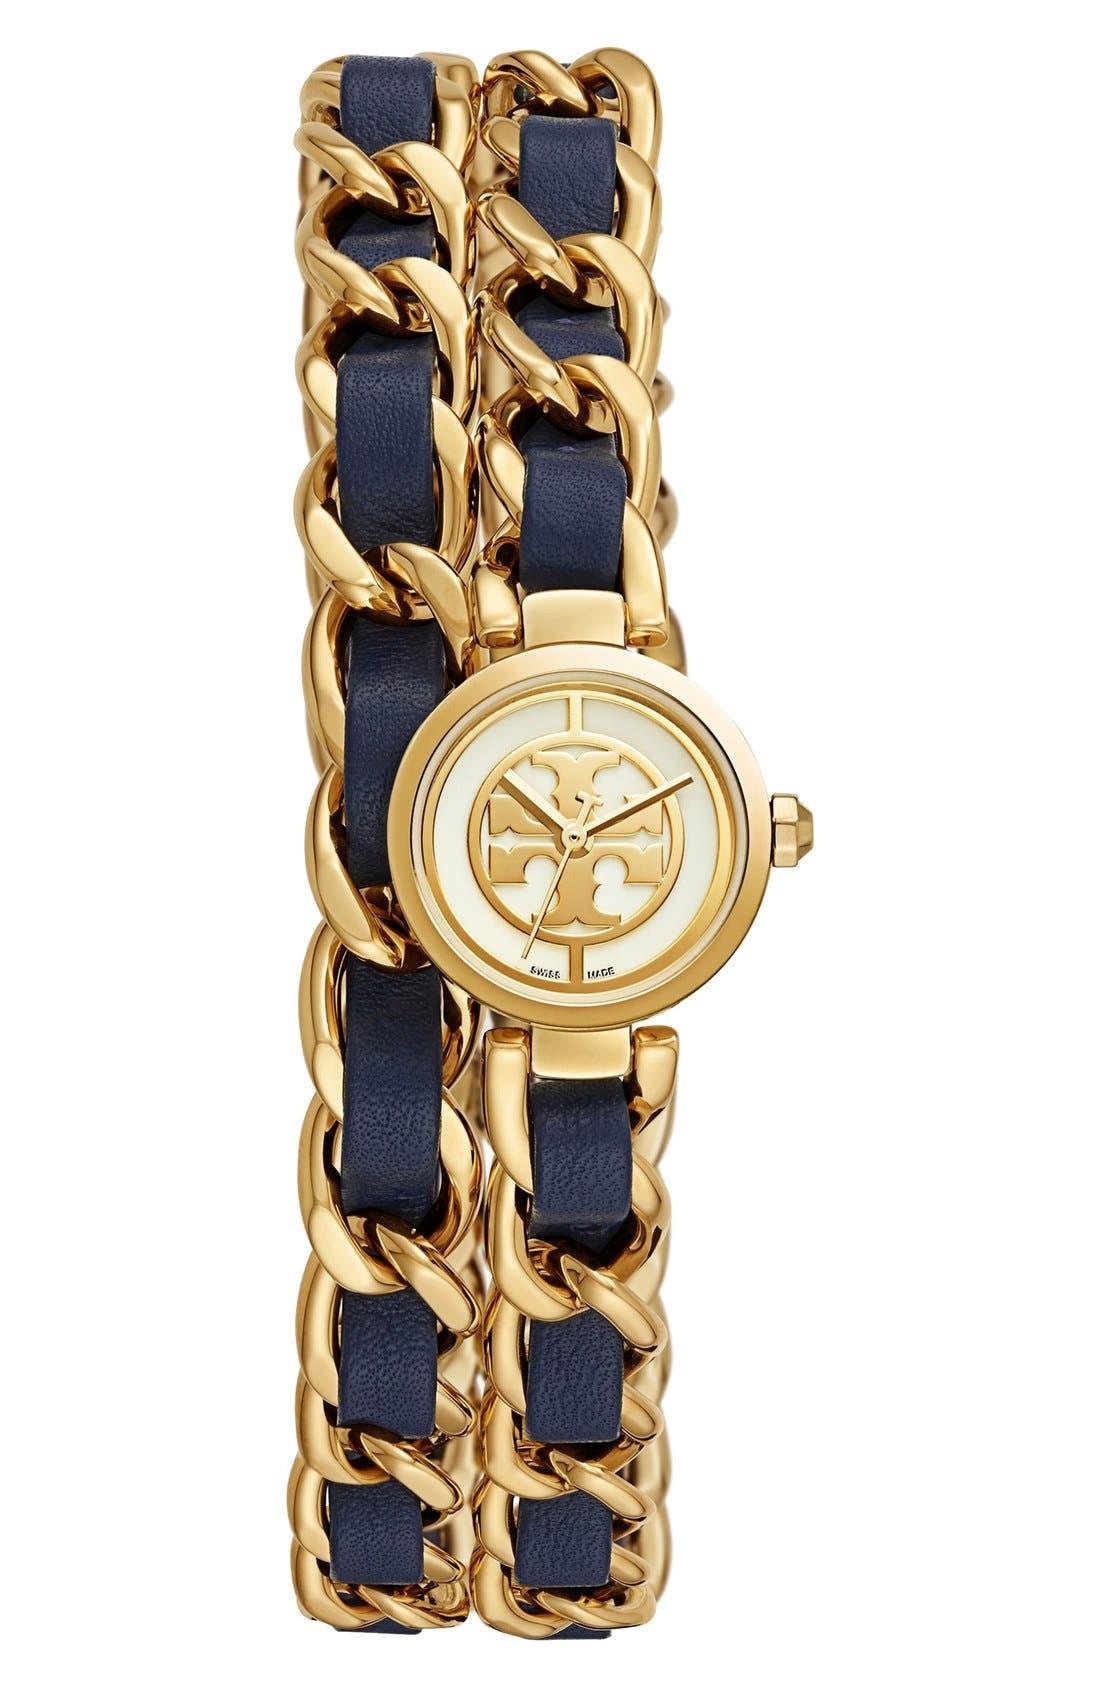 Alternate Image 1 Selected - Tory Burch 'Mini Reva' Double Wrap Chain Watch, 20mm